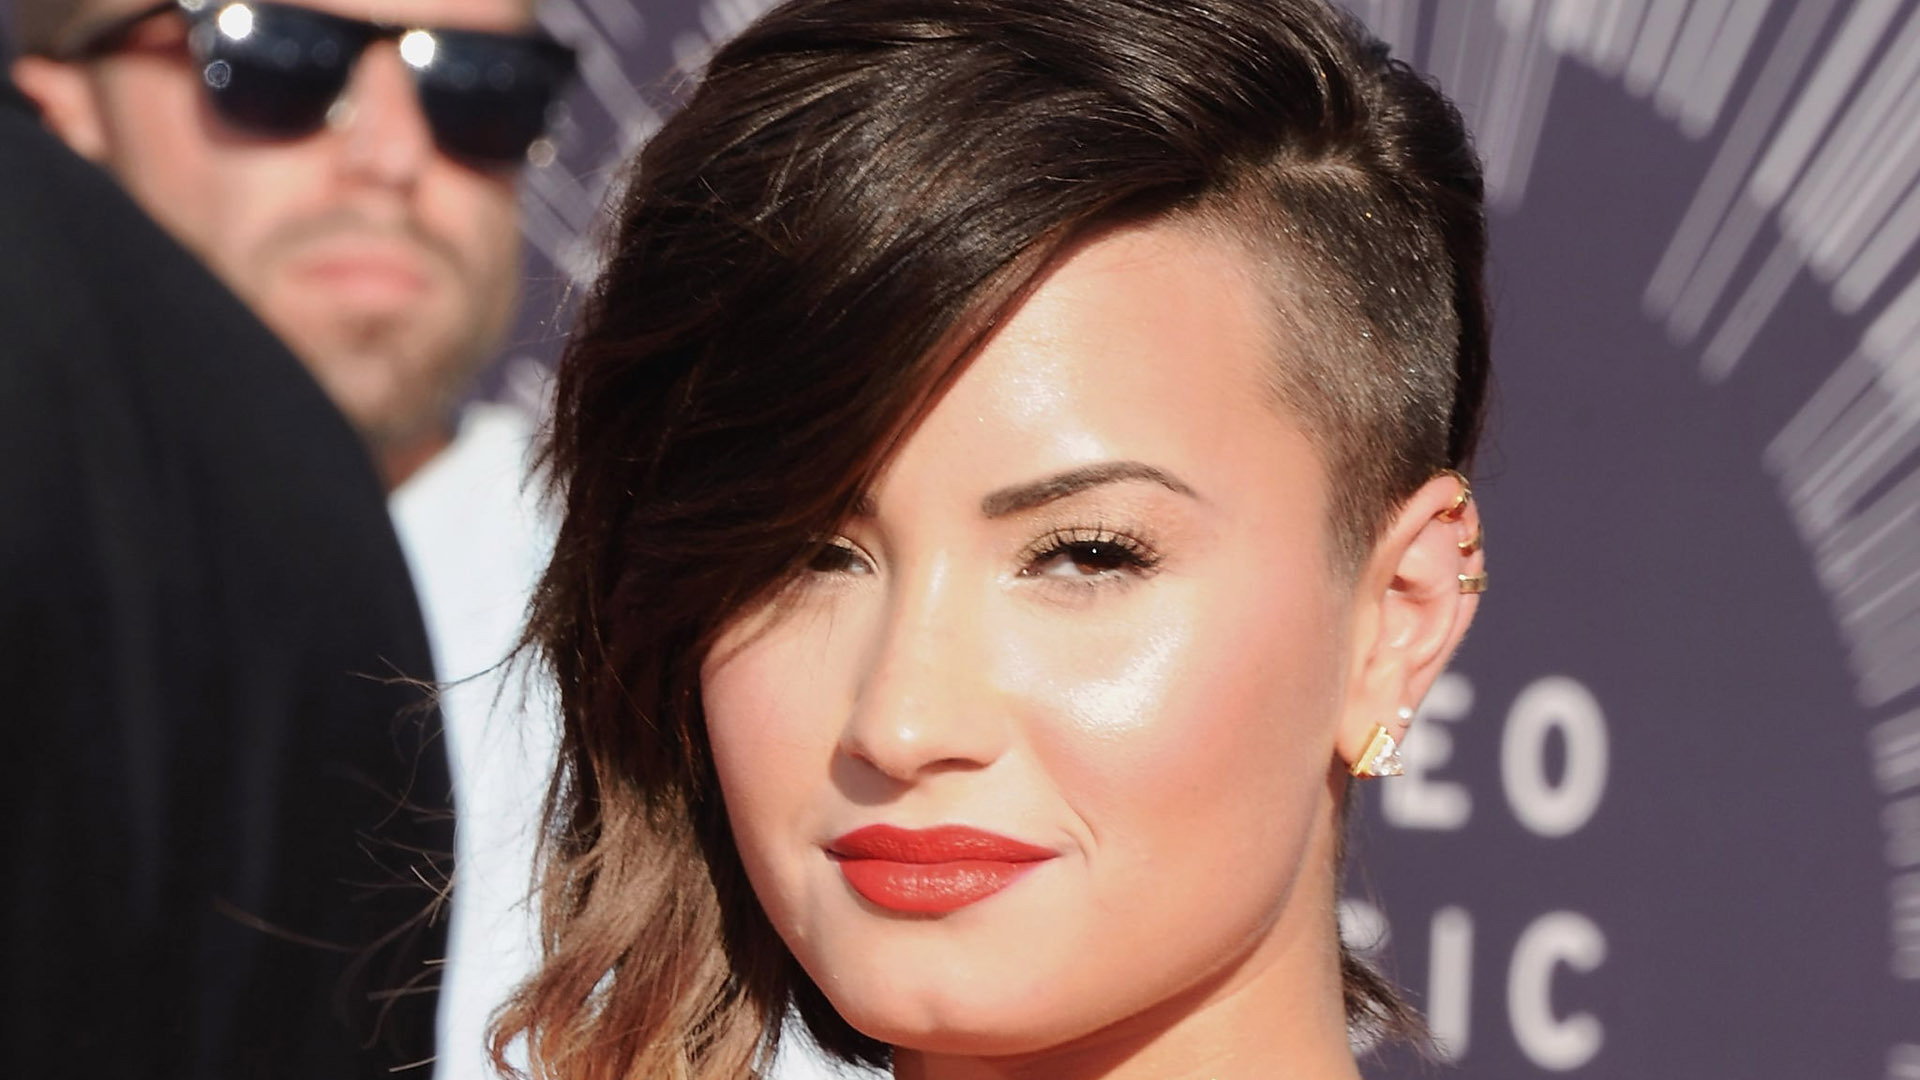 Demi Lovato Short Wallpapers Hq